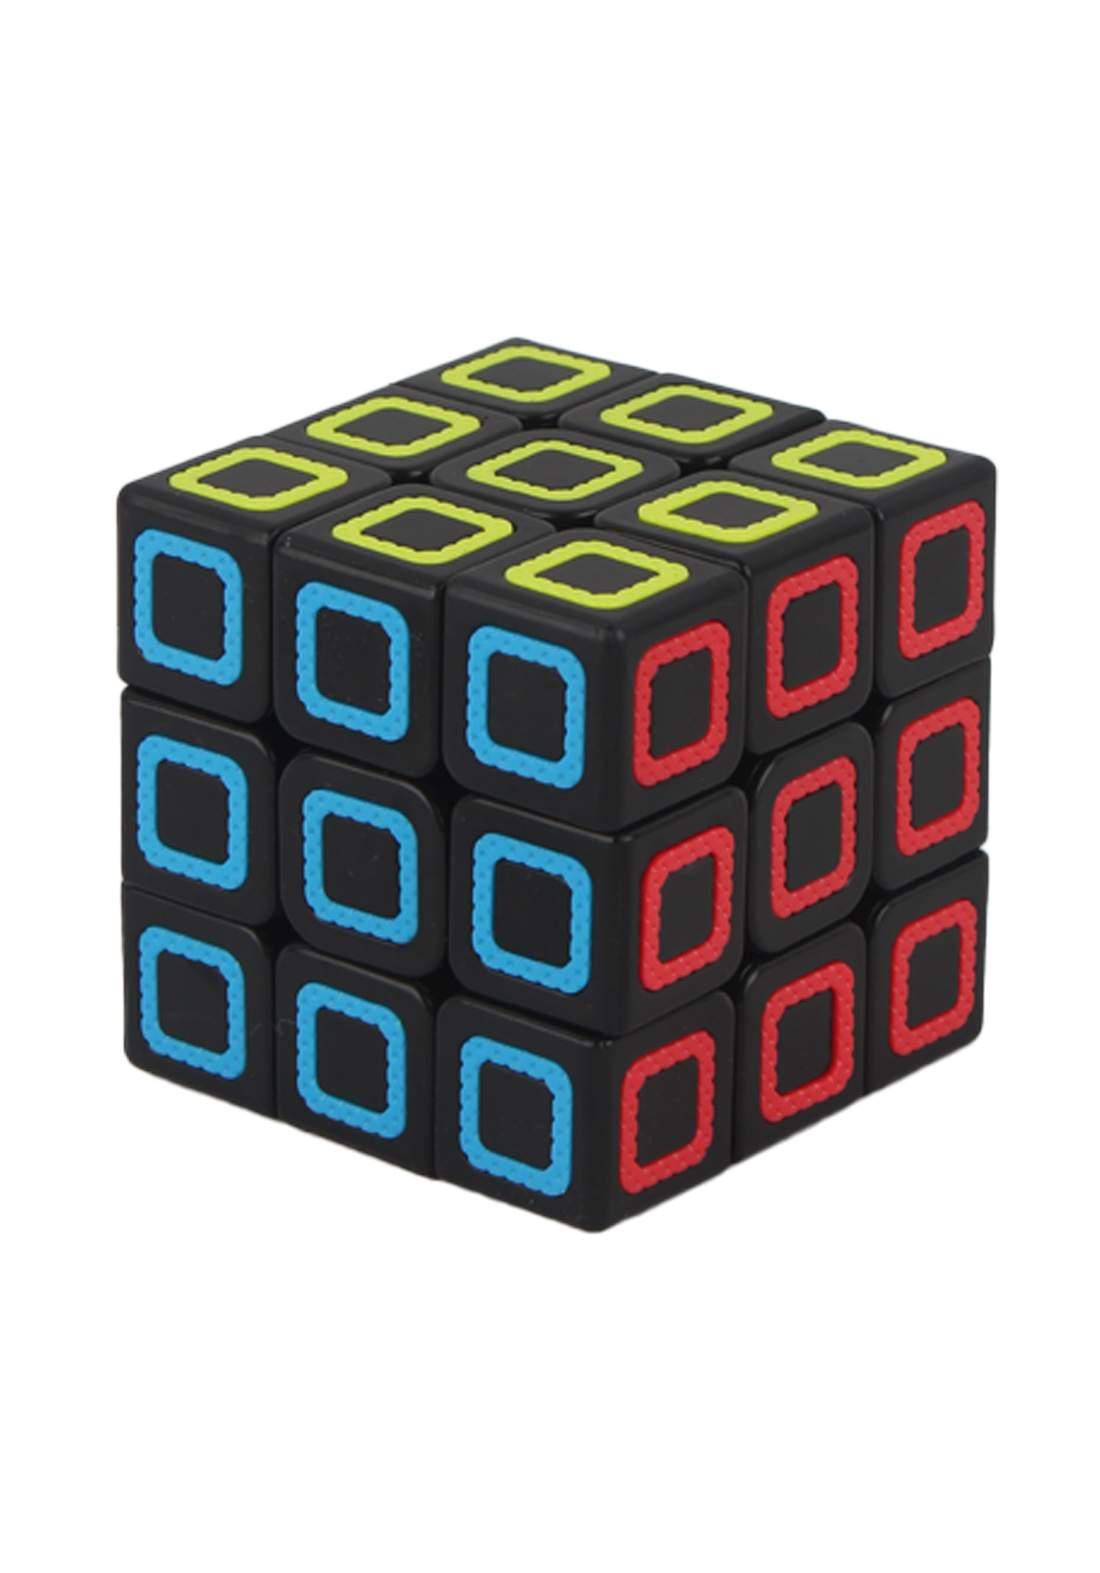 Rubik's Cube Magic Cube Tier 3 لعبة مكعب روبيك